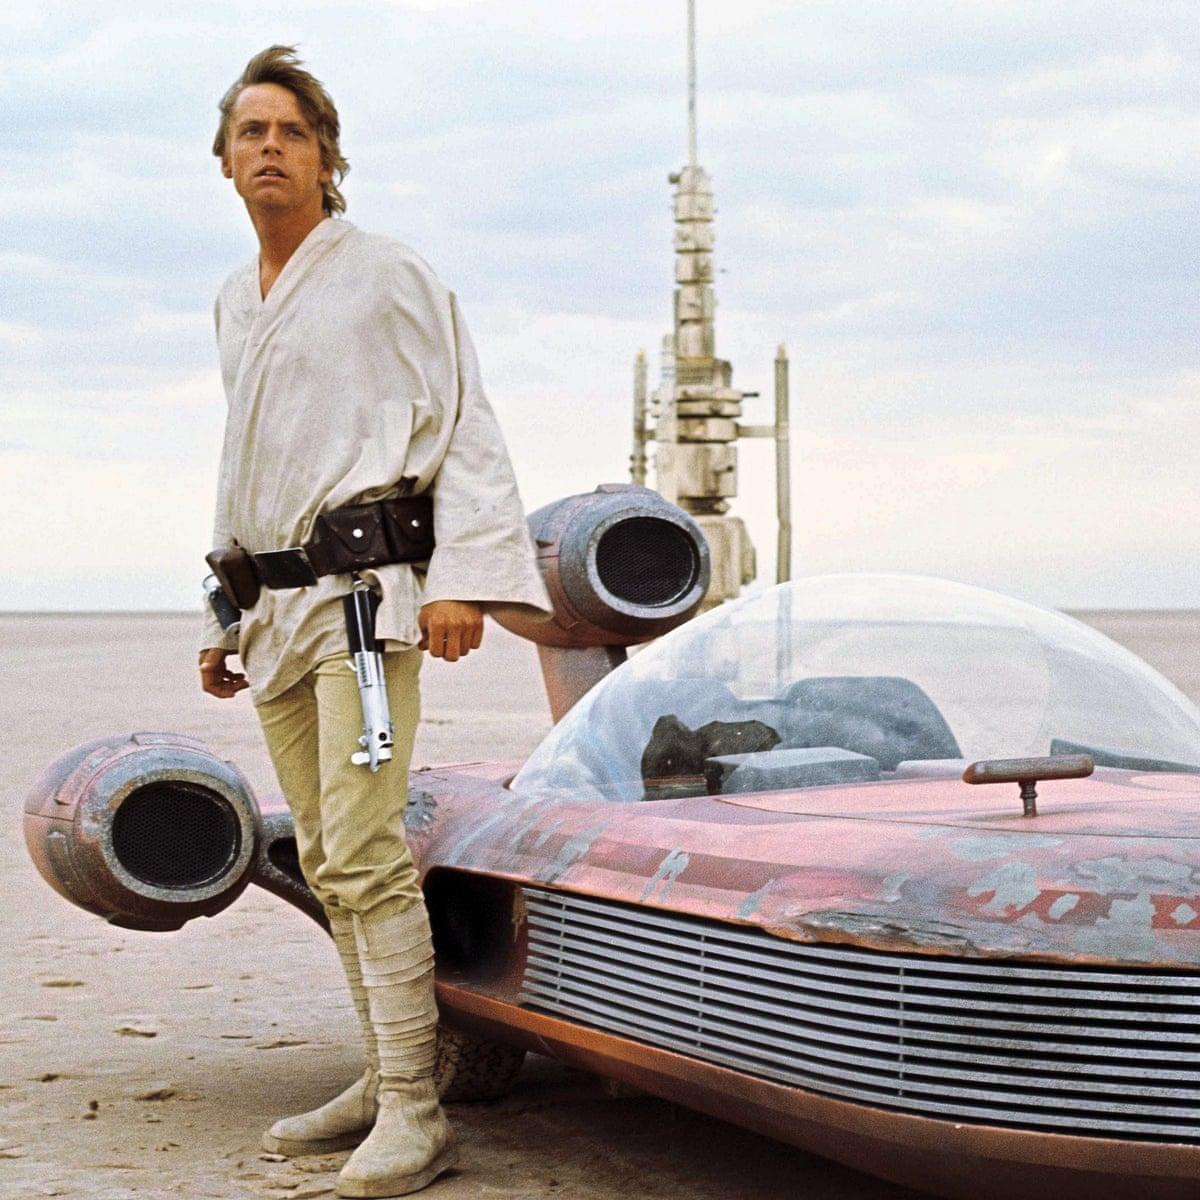 Do We Really Need Force Ghost Luke Skywalker In Star Wars Episode Ix Star Wars The Rise Of Skywalker The Guardian